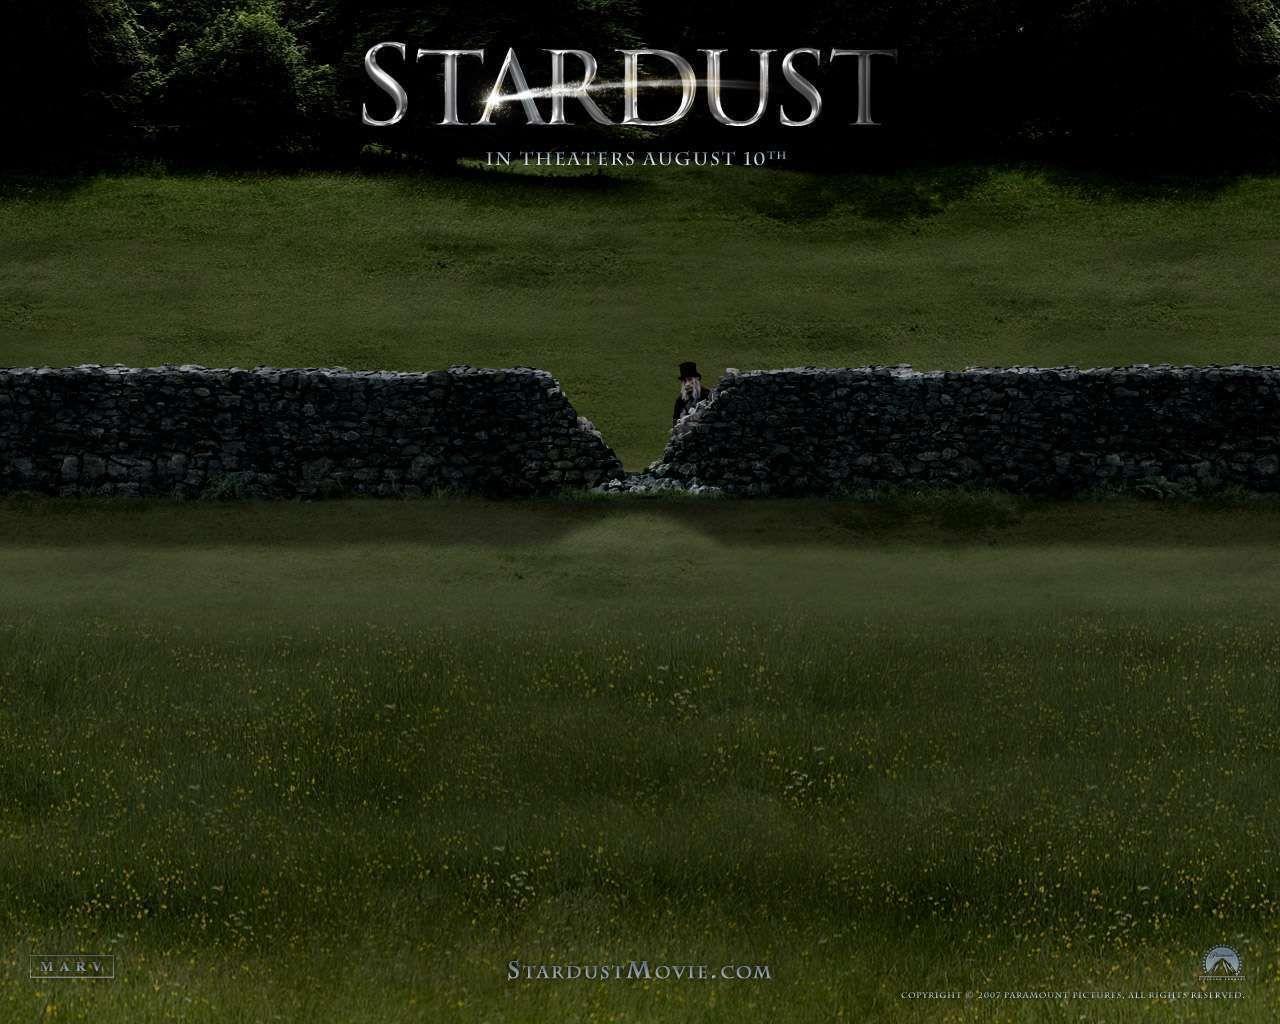 Is Stardust (movie) a traditional folktale?